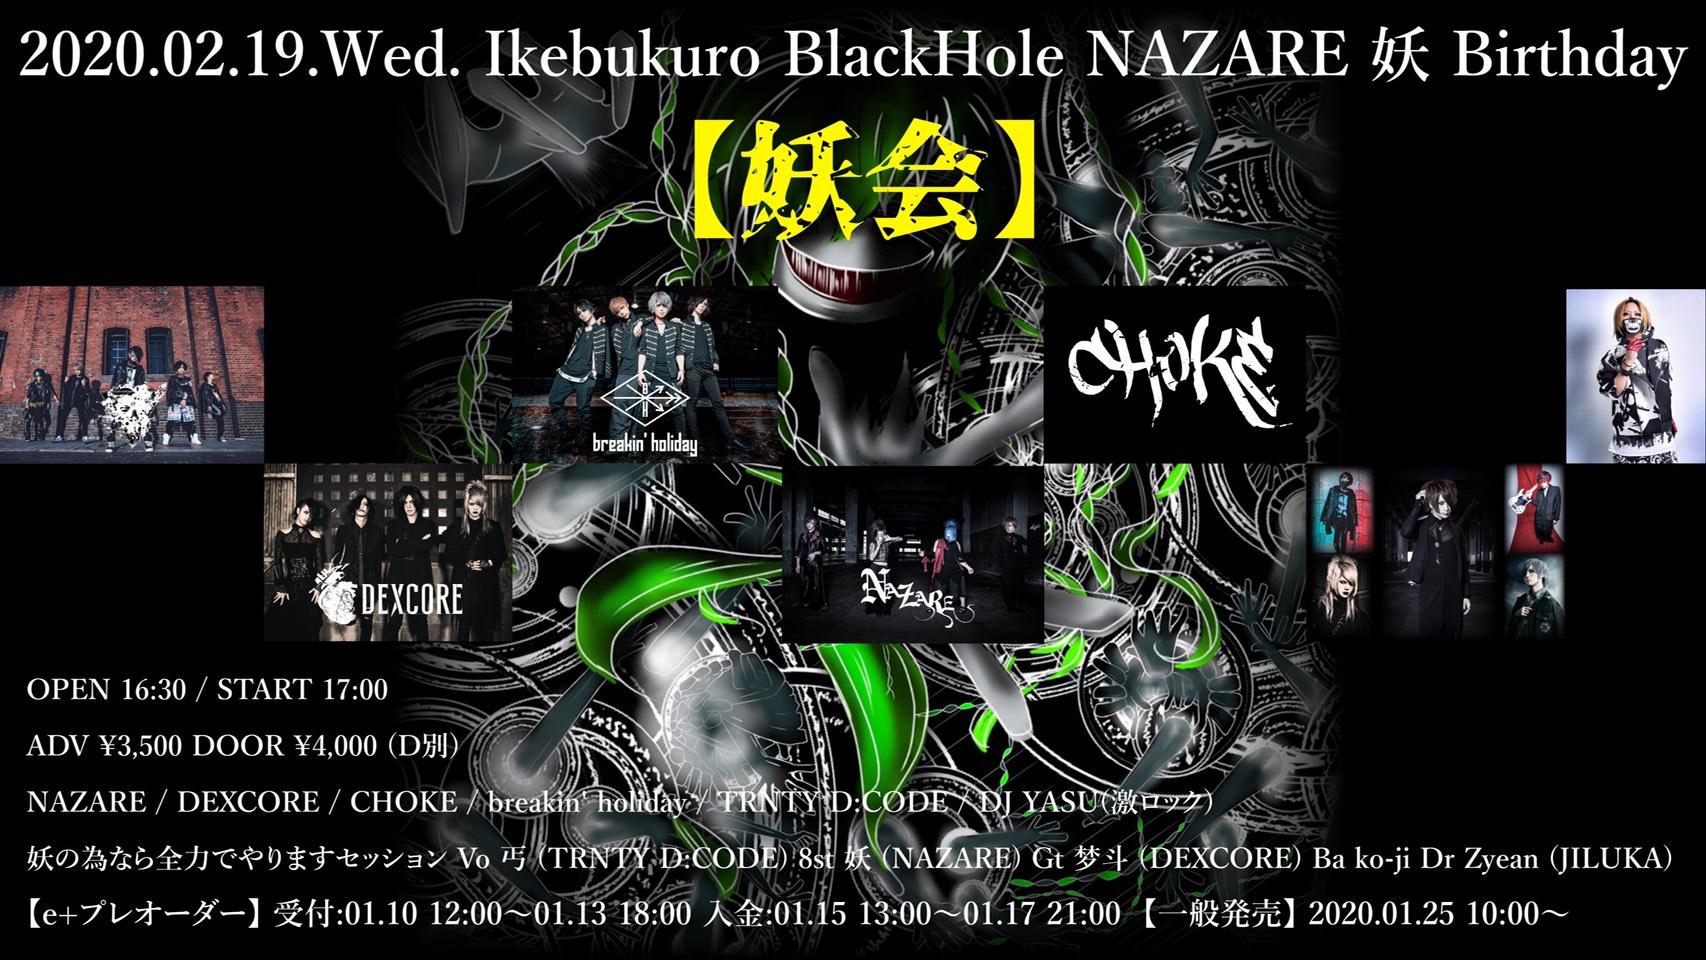 池袋●BlackHole